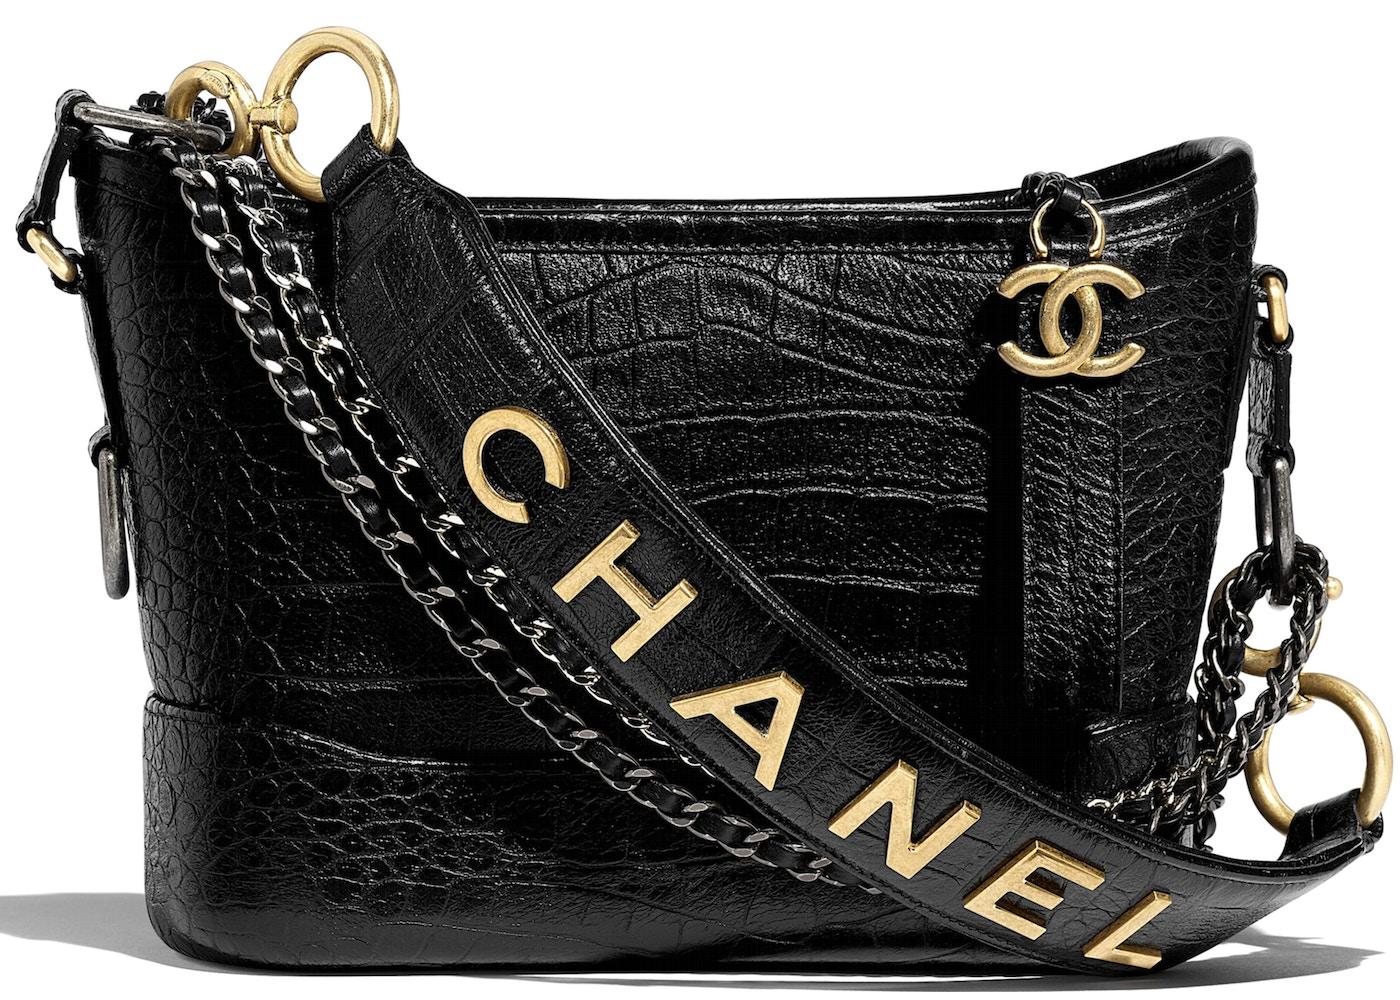 9d02b6e1a810f1 Chanel Gabrielle Hobo Bag Crocodile Embossed Calfskin Gold/Silver-tone Small  Black. Crocodile Embossed Calfskin Gold/Silver-tone Small Black